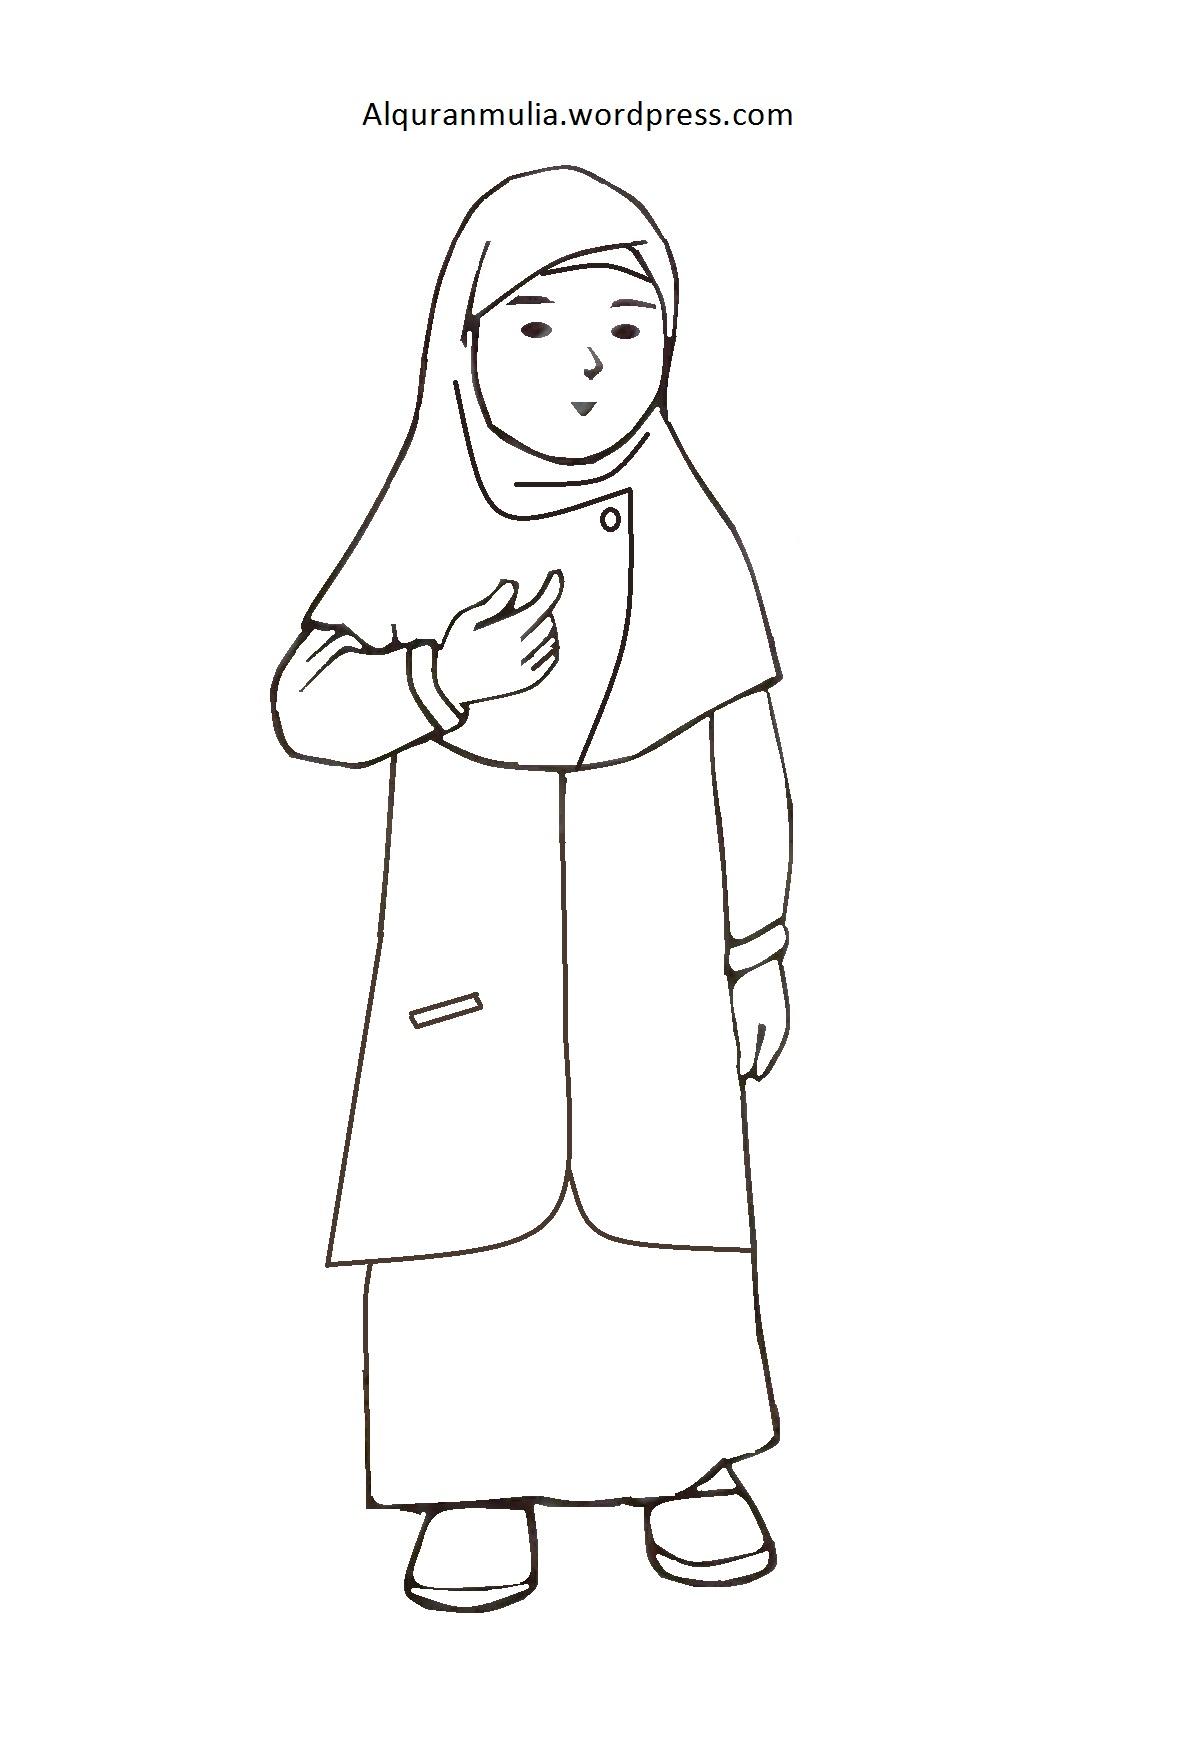 Mewarnai Gambar Kartun Anak Muslimah 16